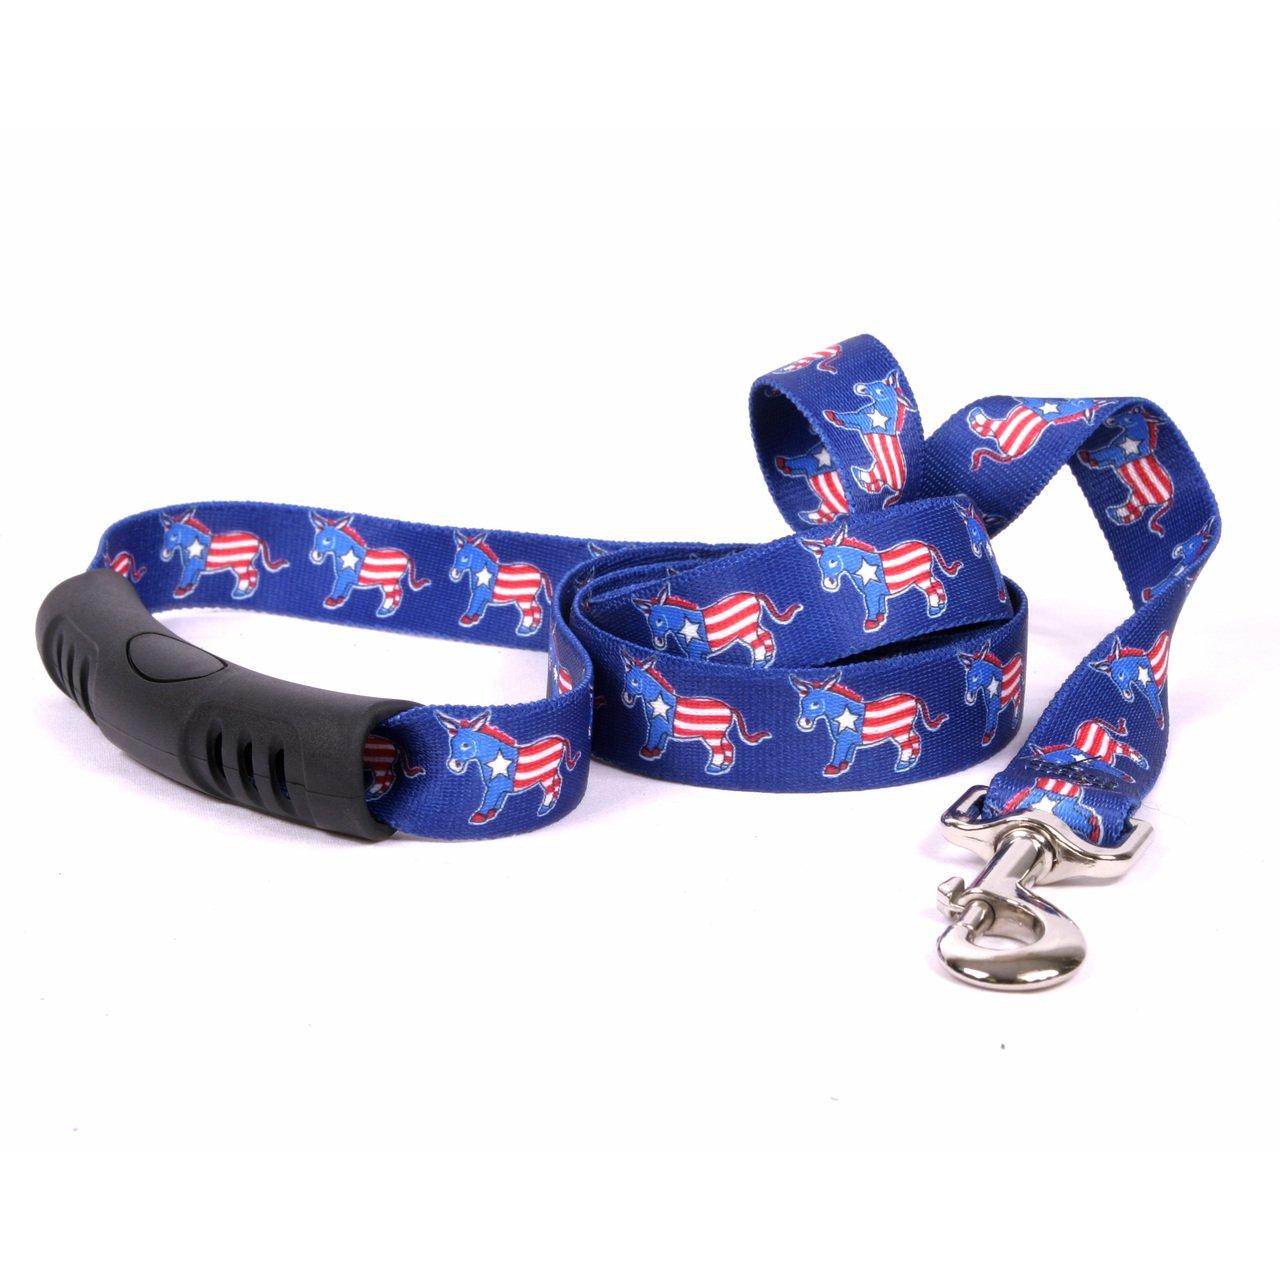 Yellow Dog Design Dem Donkeys Ez-Grip Dog Leash with Comfort Handle 3/4'' Wide and 5' (60'') Long, Small/Medium